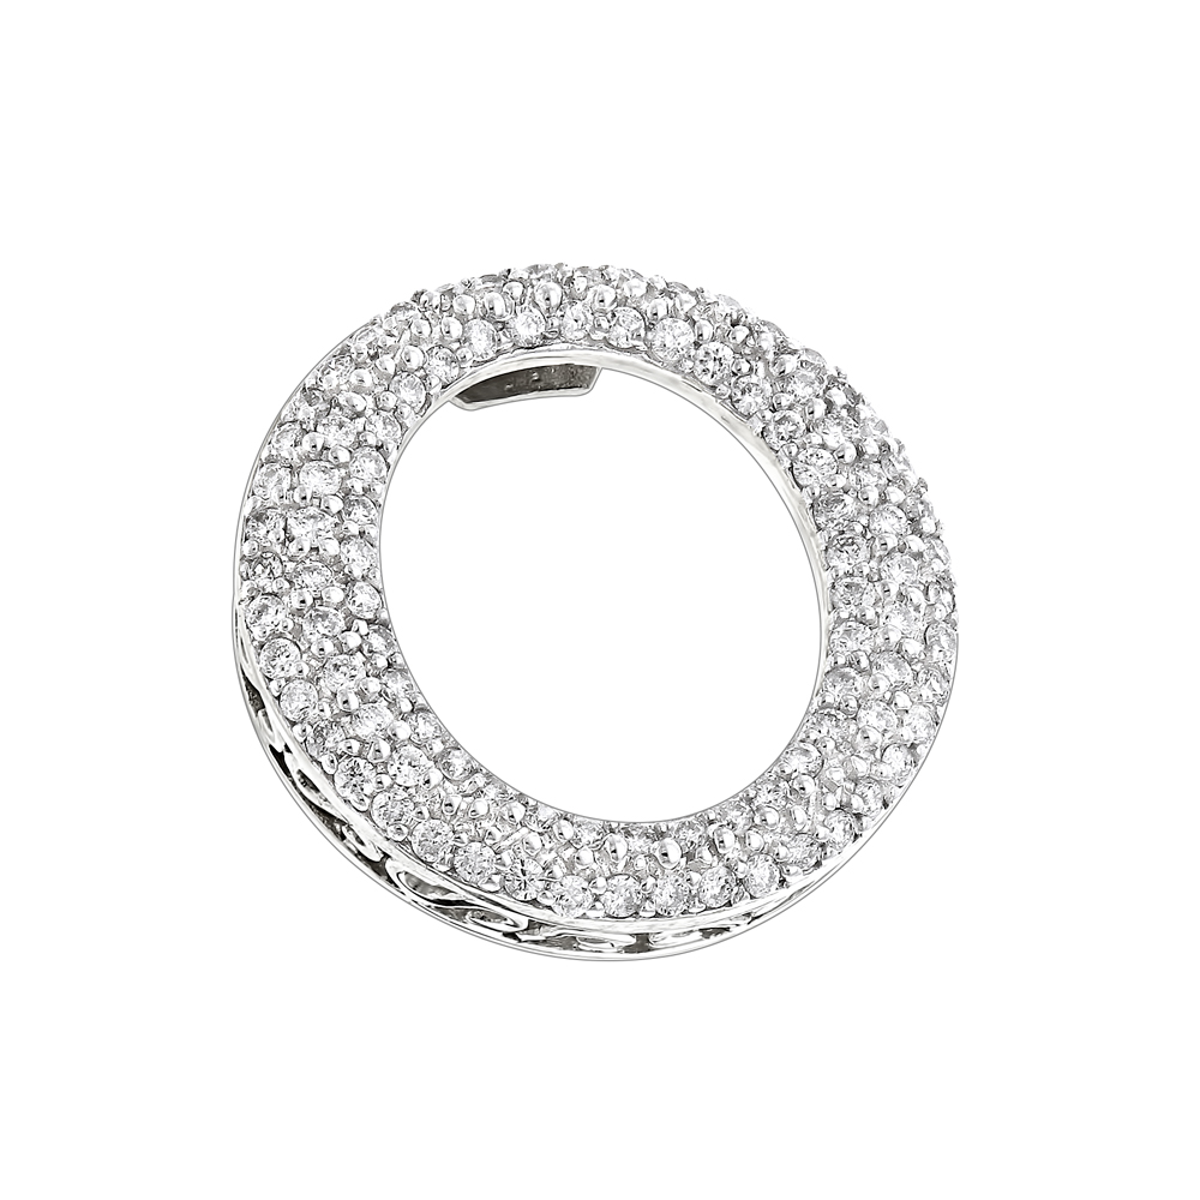 Pave Diamond O Pendant 0.4ct 14K Gold Circle Jewelry